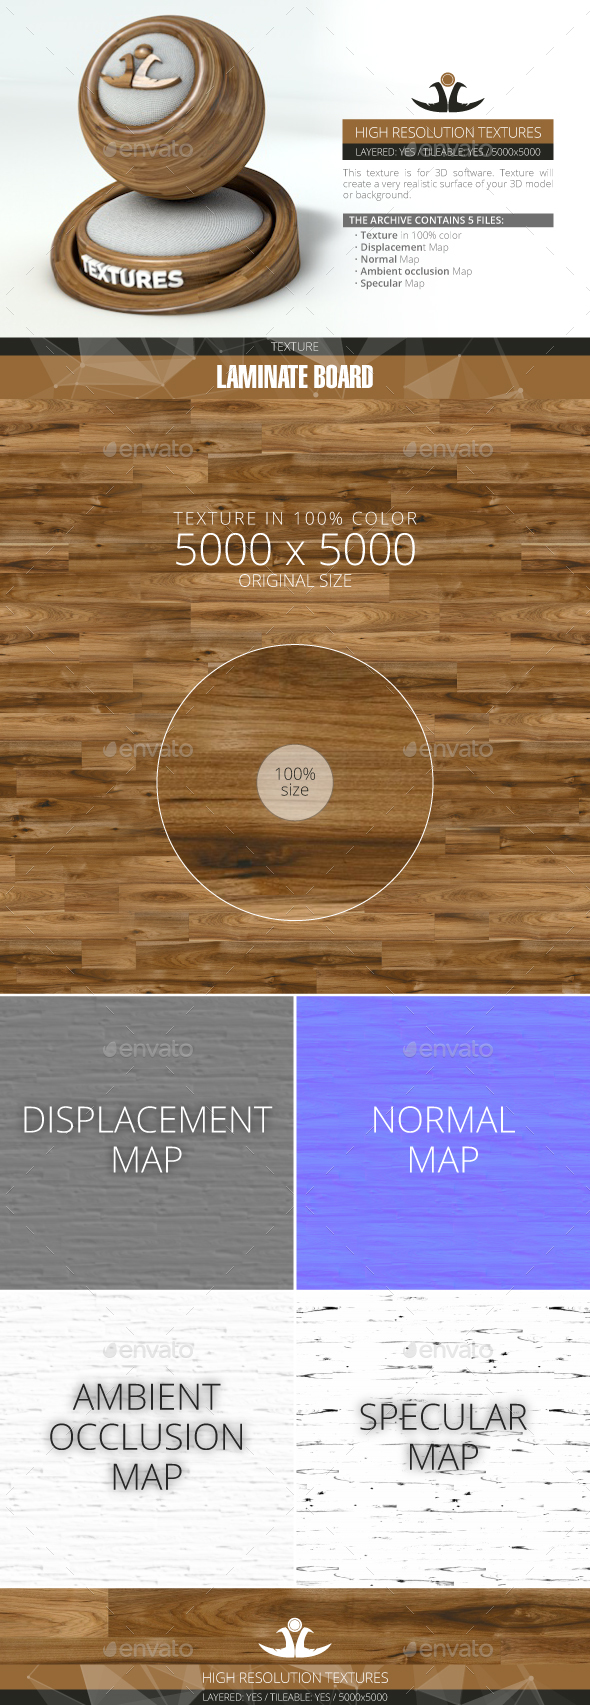 Laminate Board 19 - 3DOcean Item for Sale